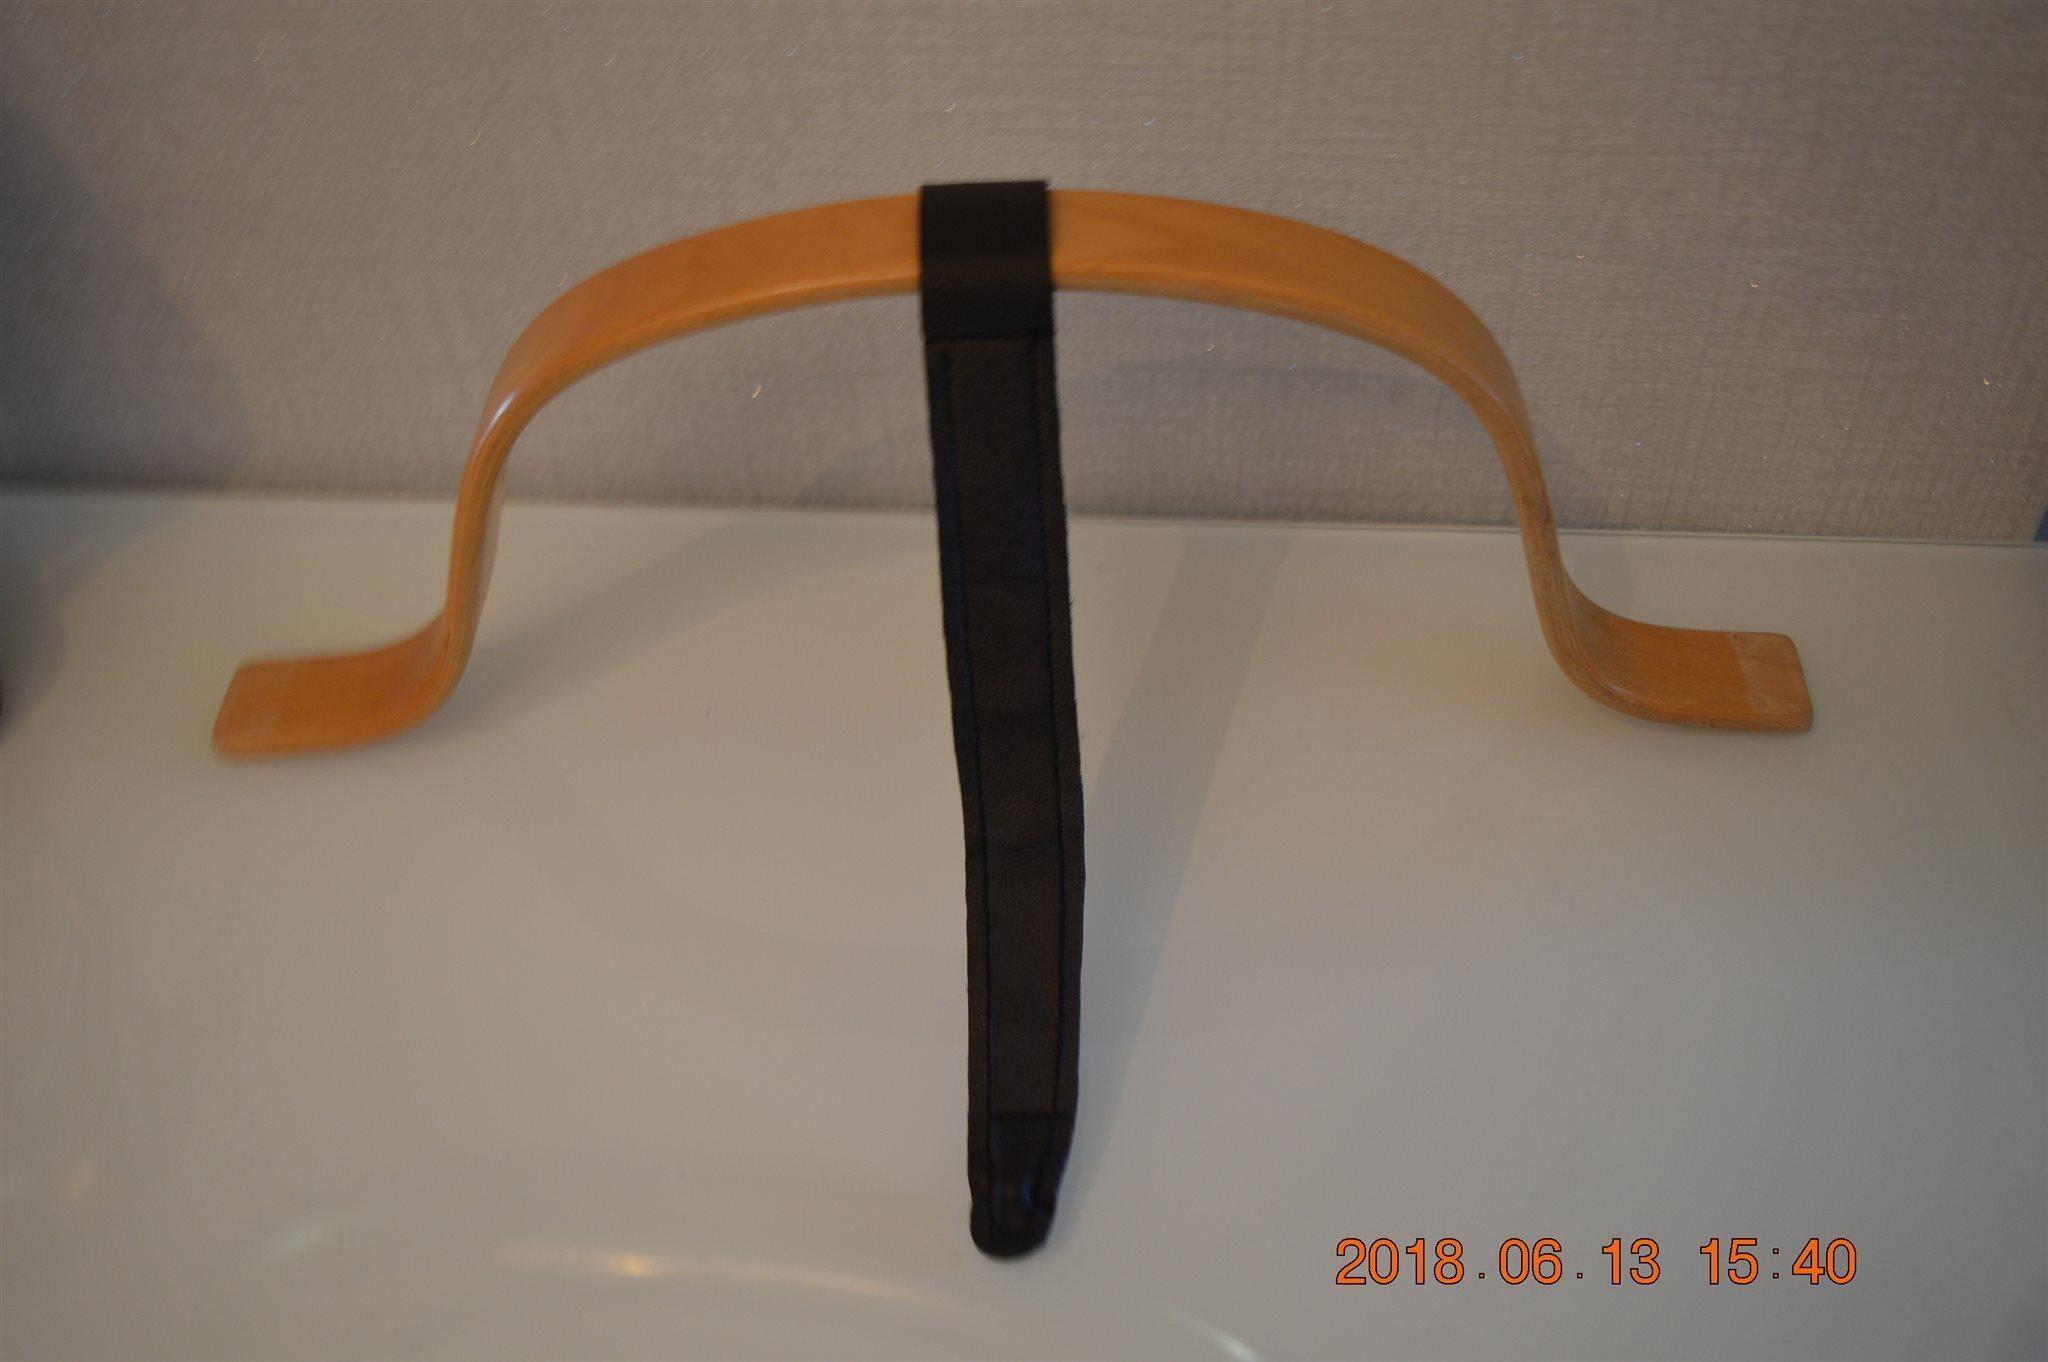 stokke bygel och rem till stokke tripp trapp stol (311668251) ᐈ köp